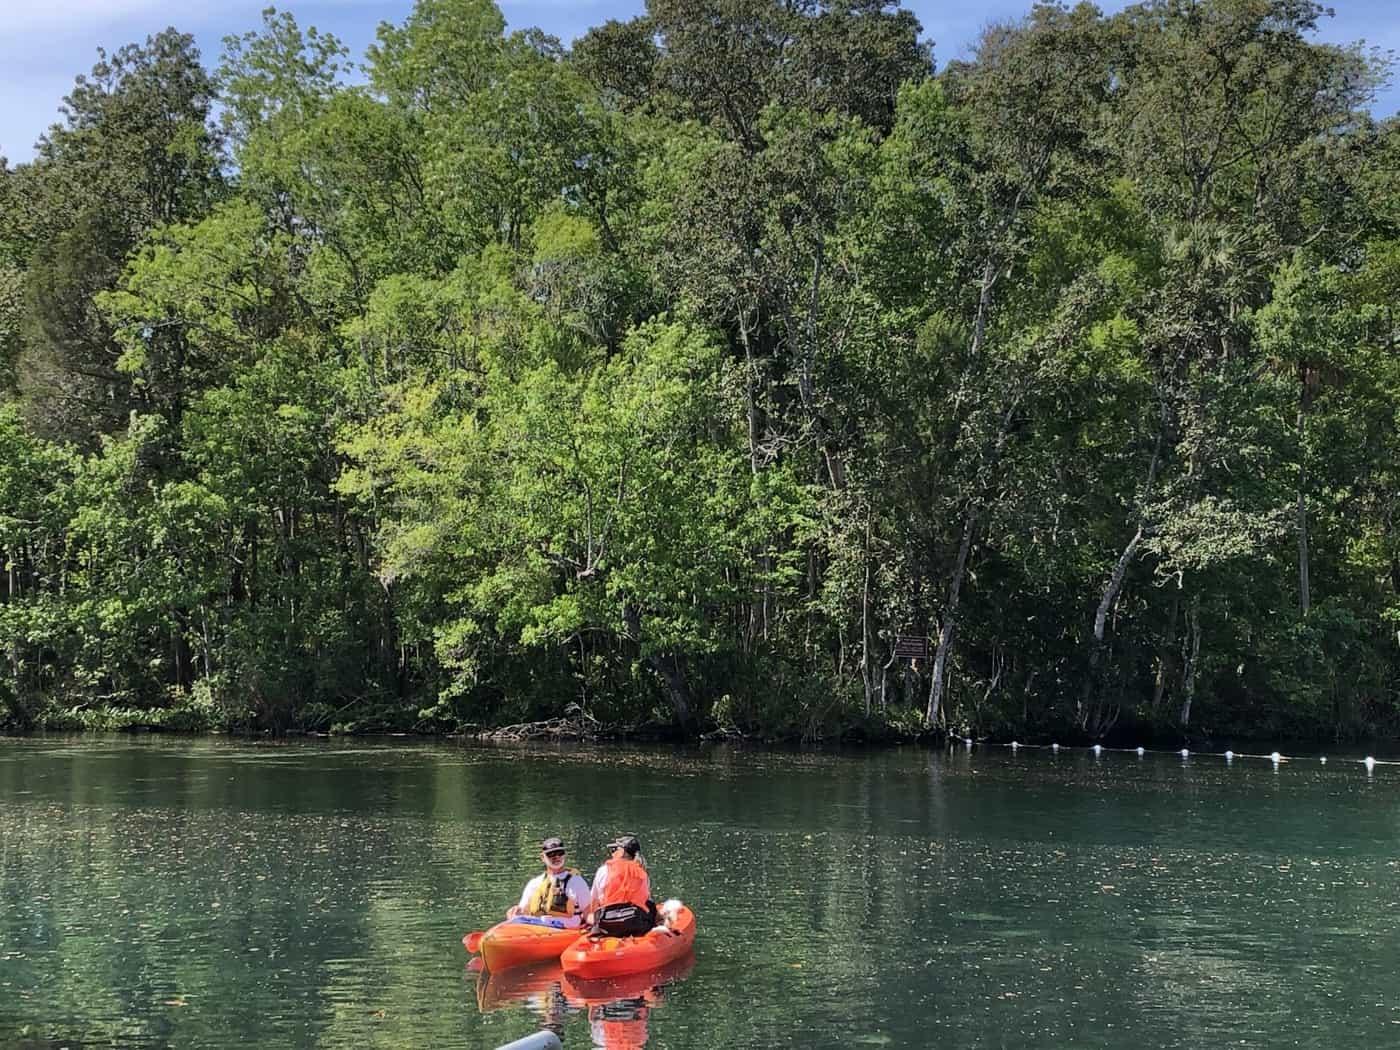 Kayaks on the water, Homosassa Springs